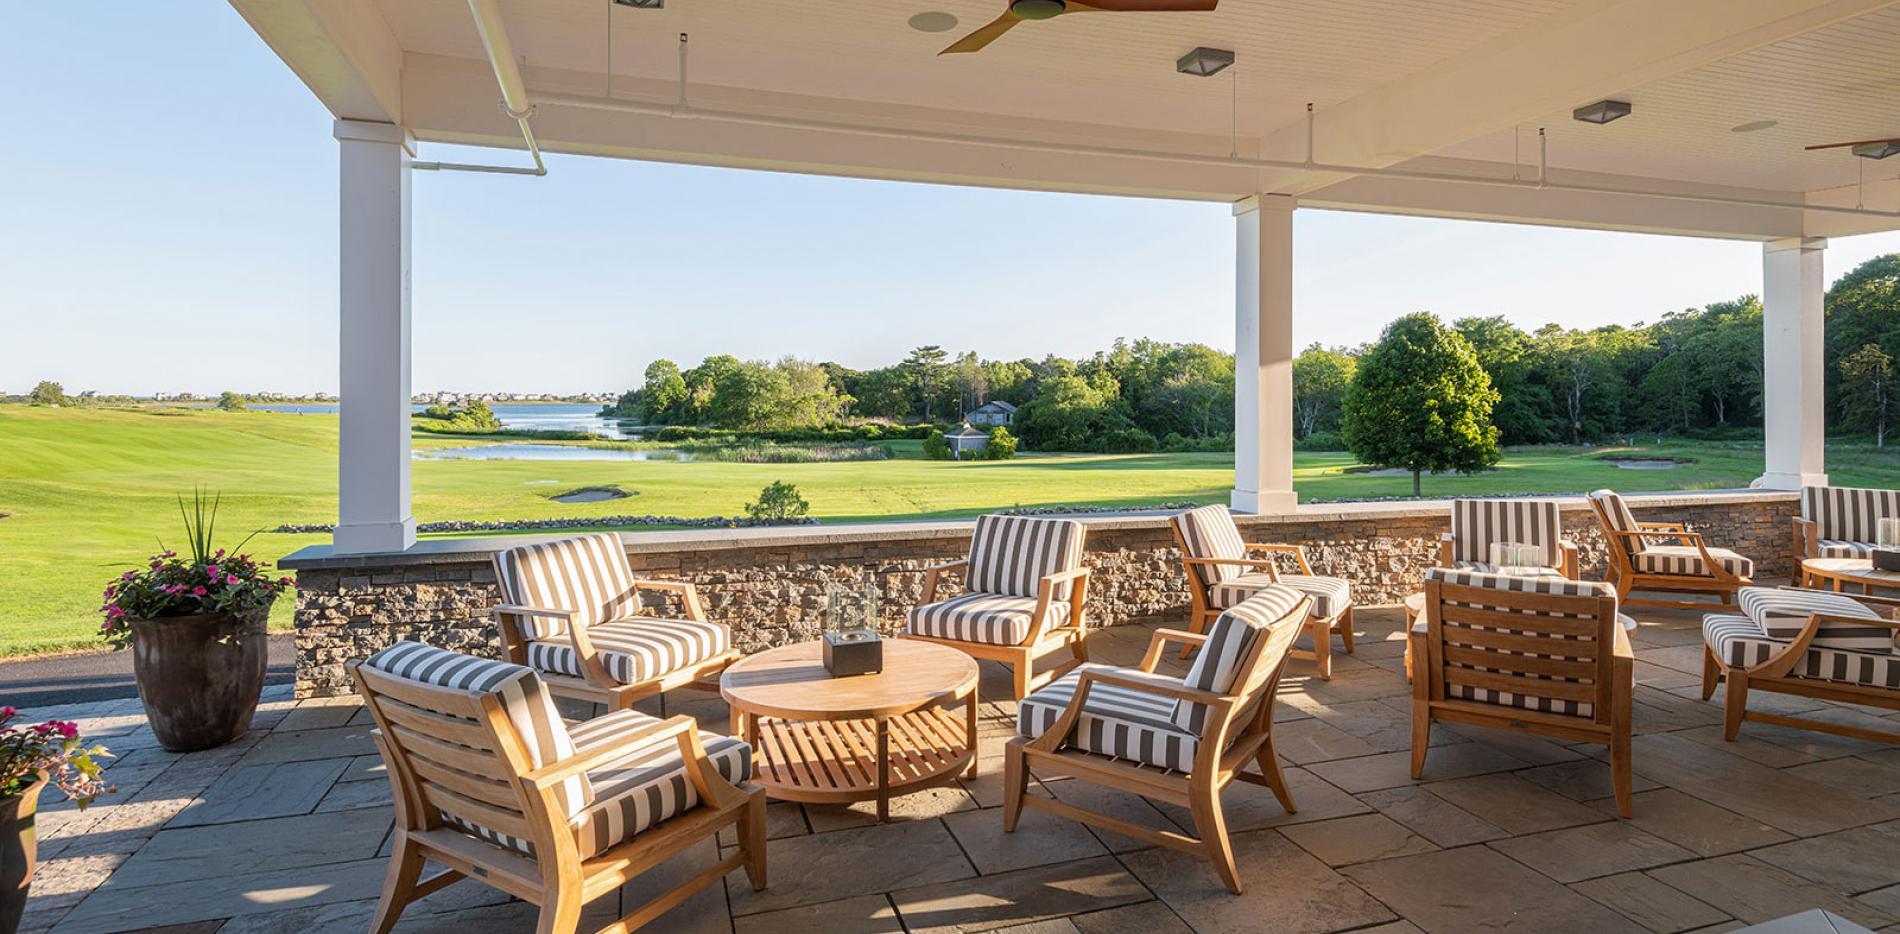 Weekapaug Golf Club patio